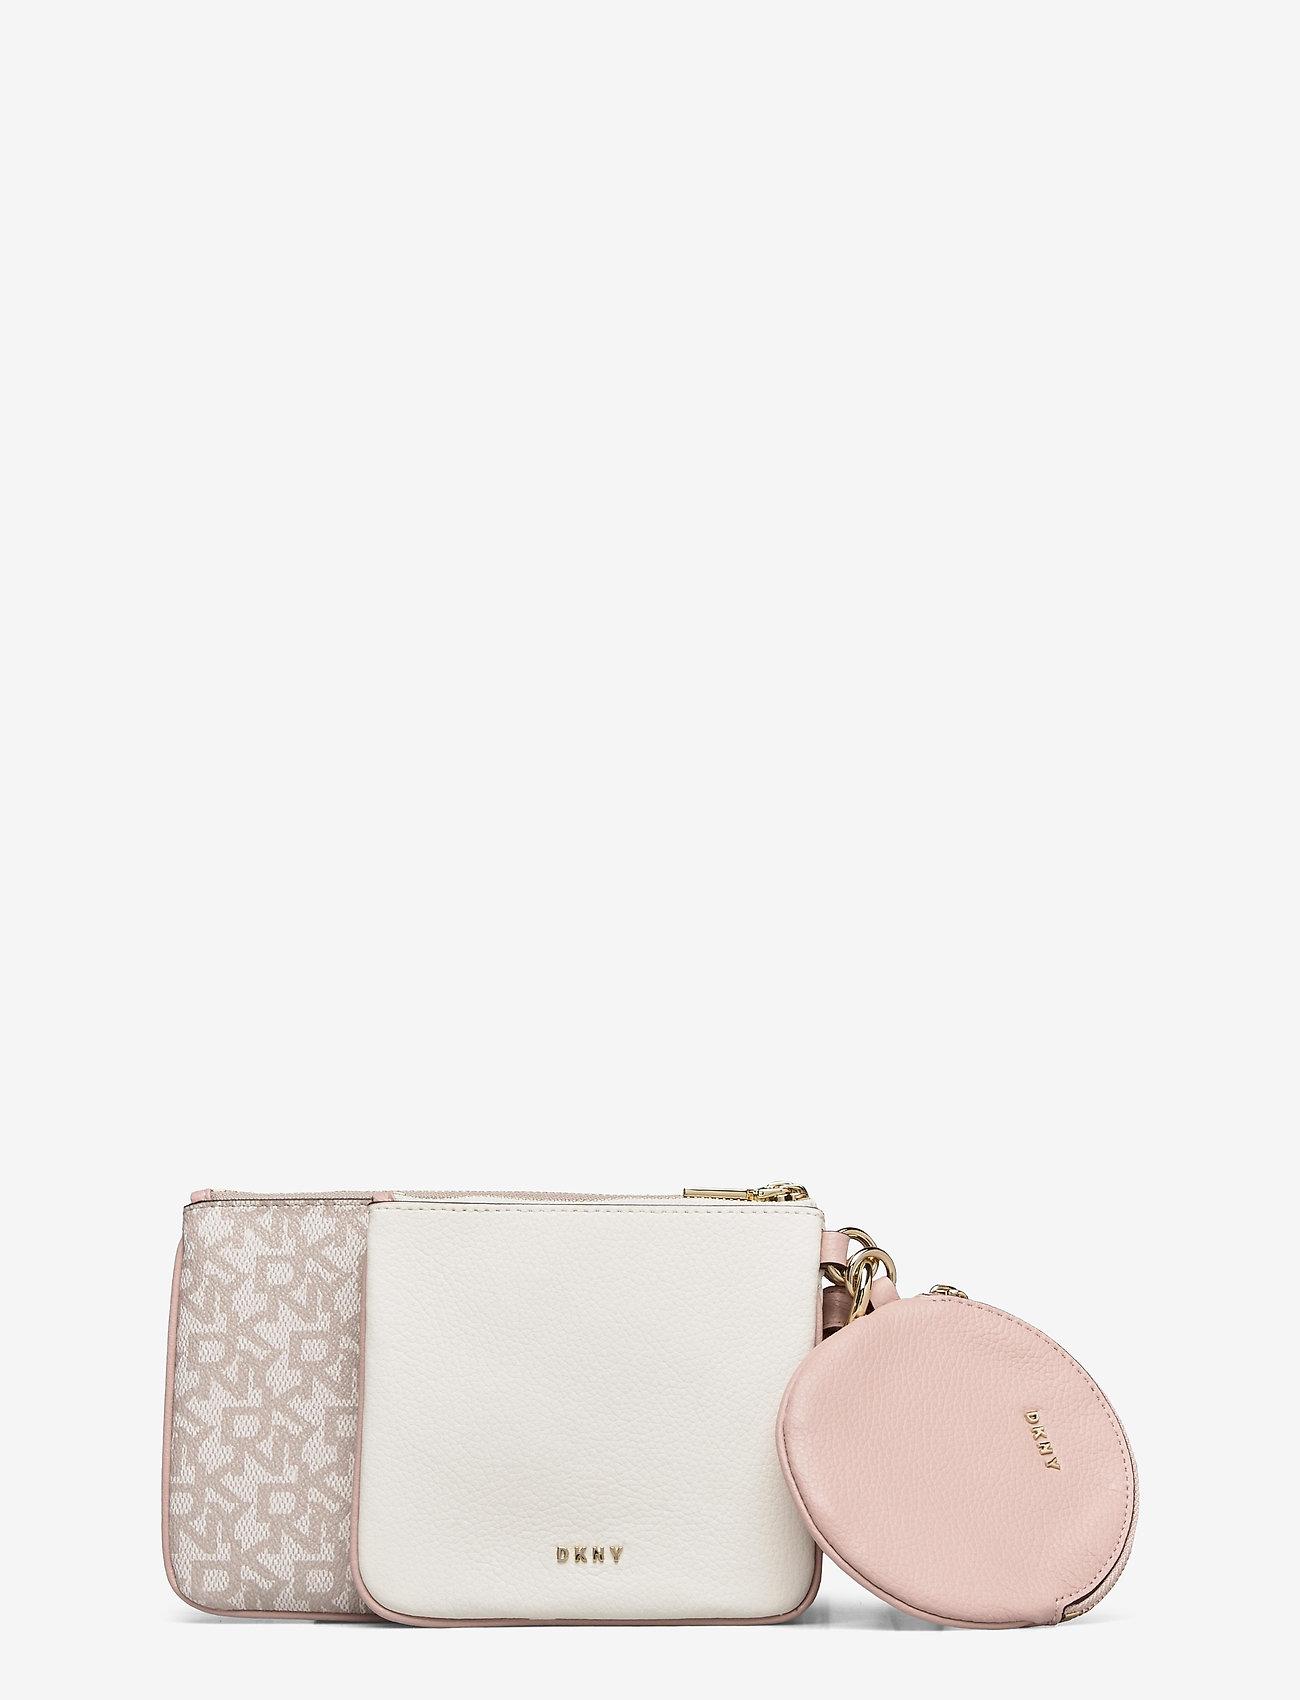 DKNY Bags - TRIPLE POUCH - kirjekuorilaukut - cashmere cmb - 0